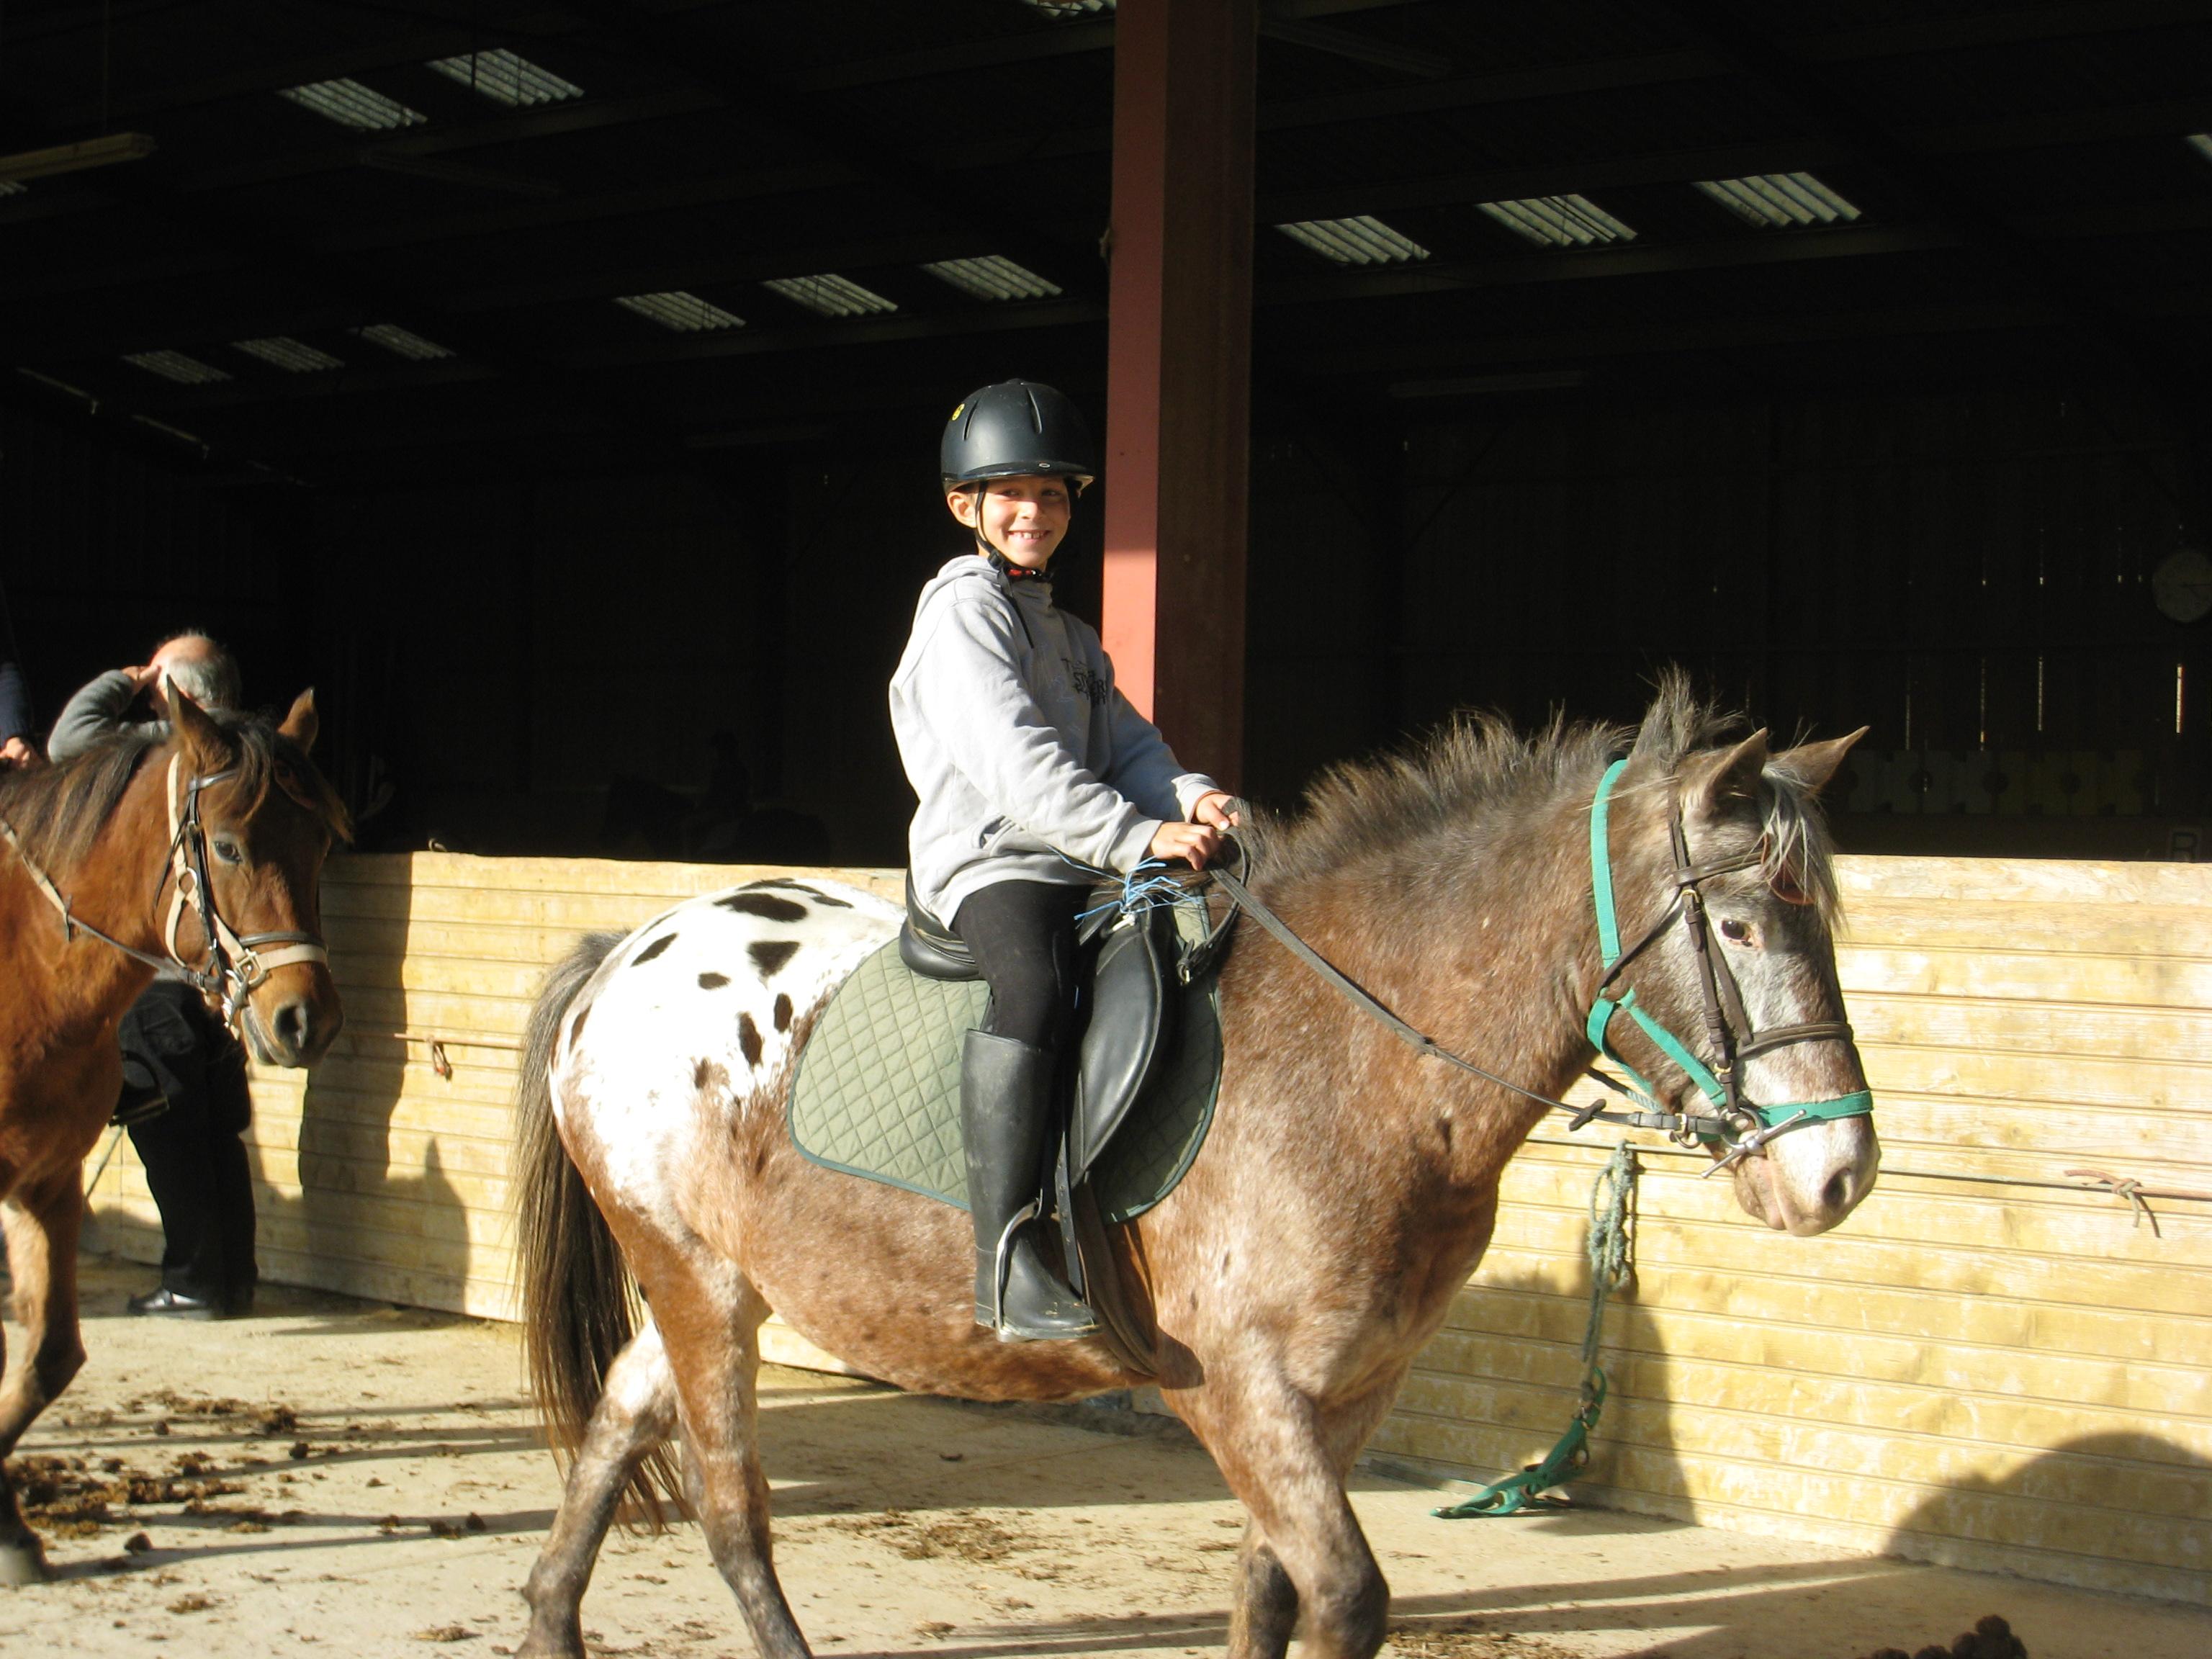 Horse-ridding